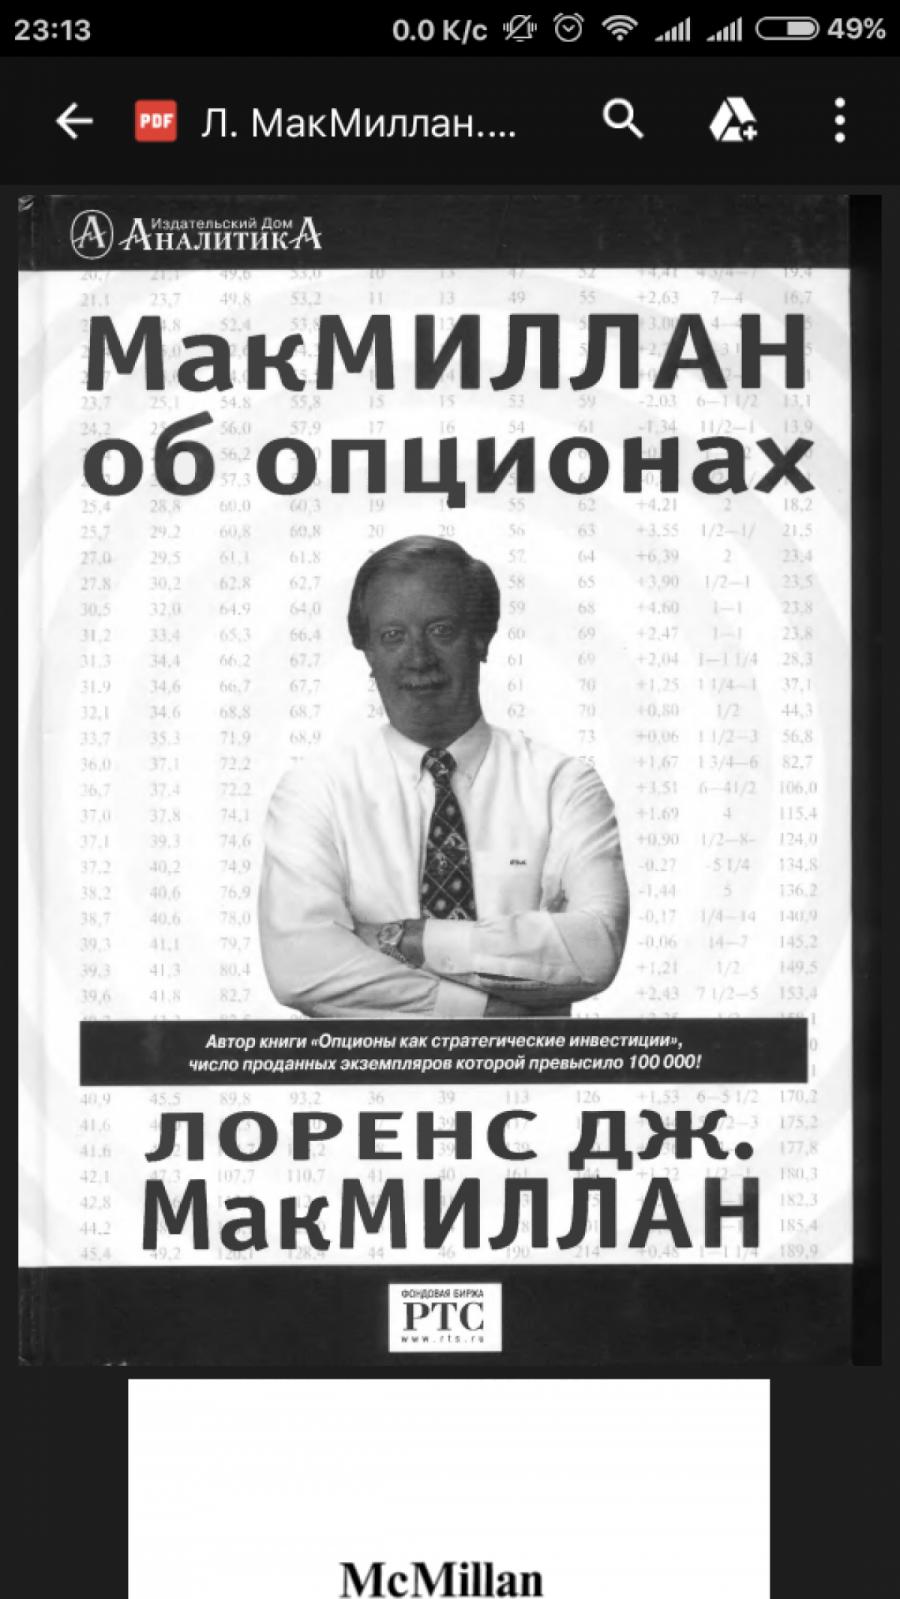 Обложка книги:  лоренс дж. макмиллан - макмиллан об опционах